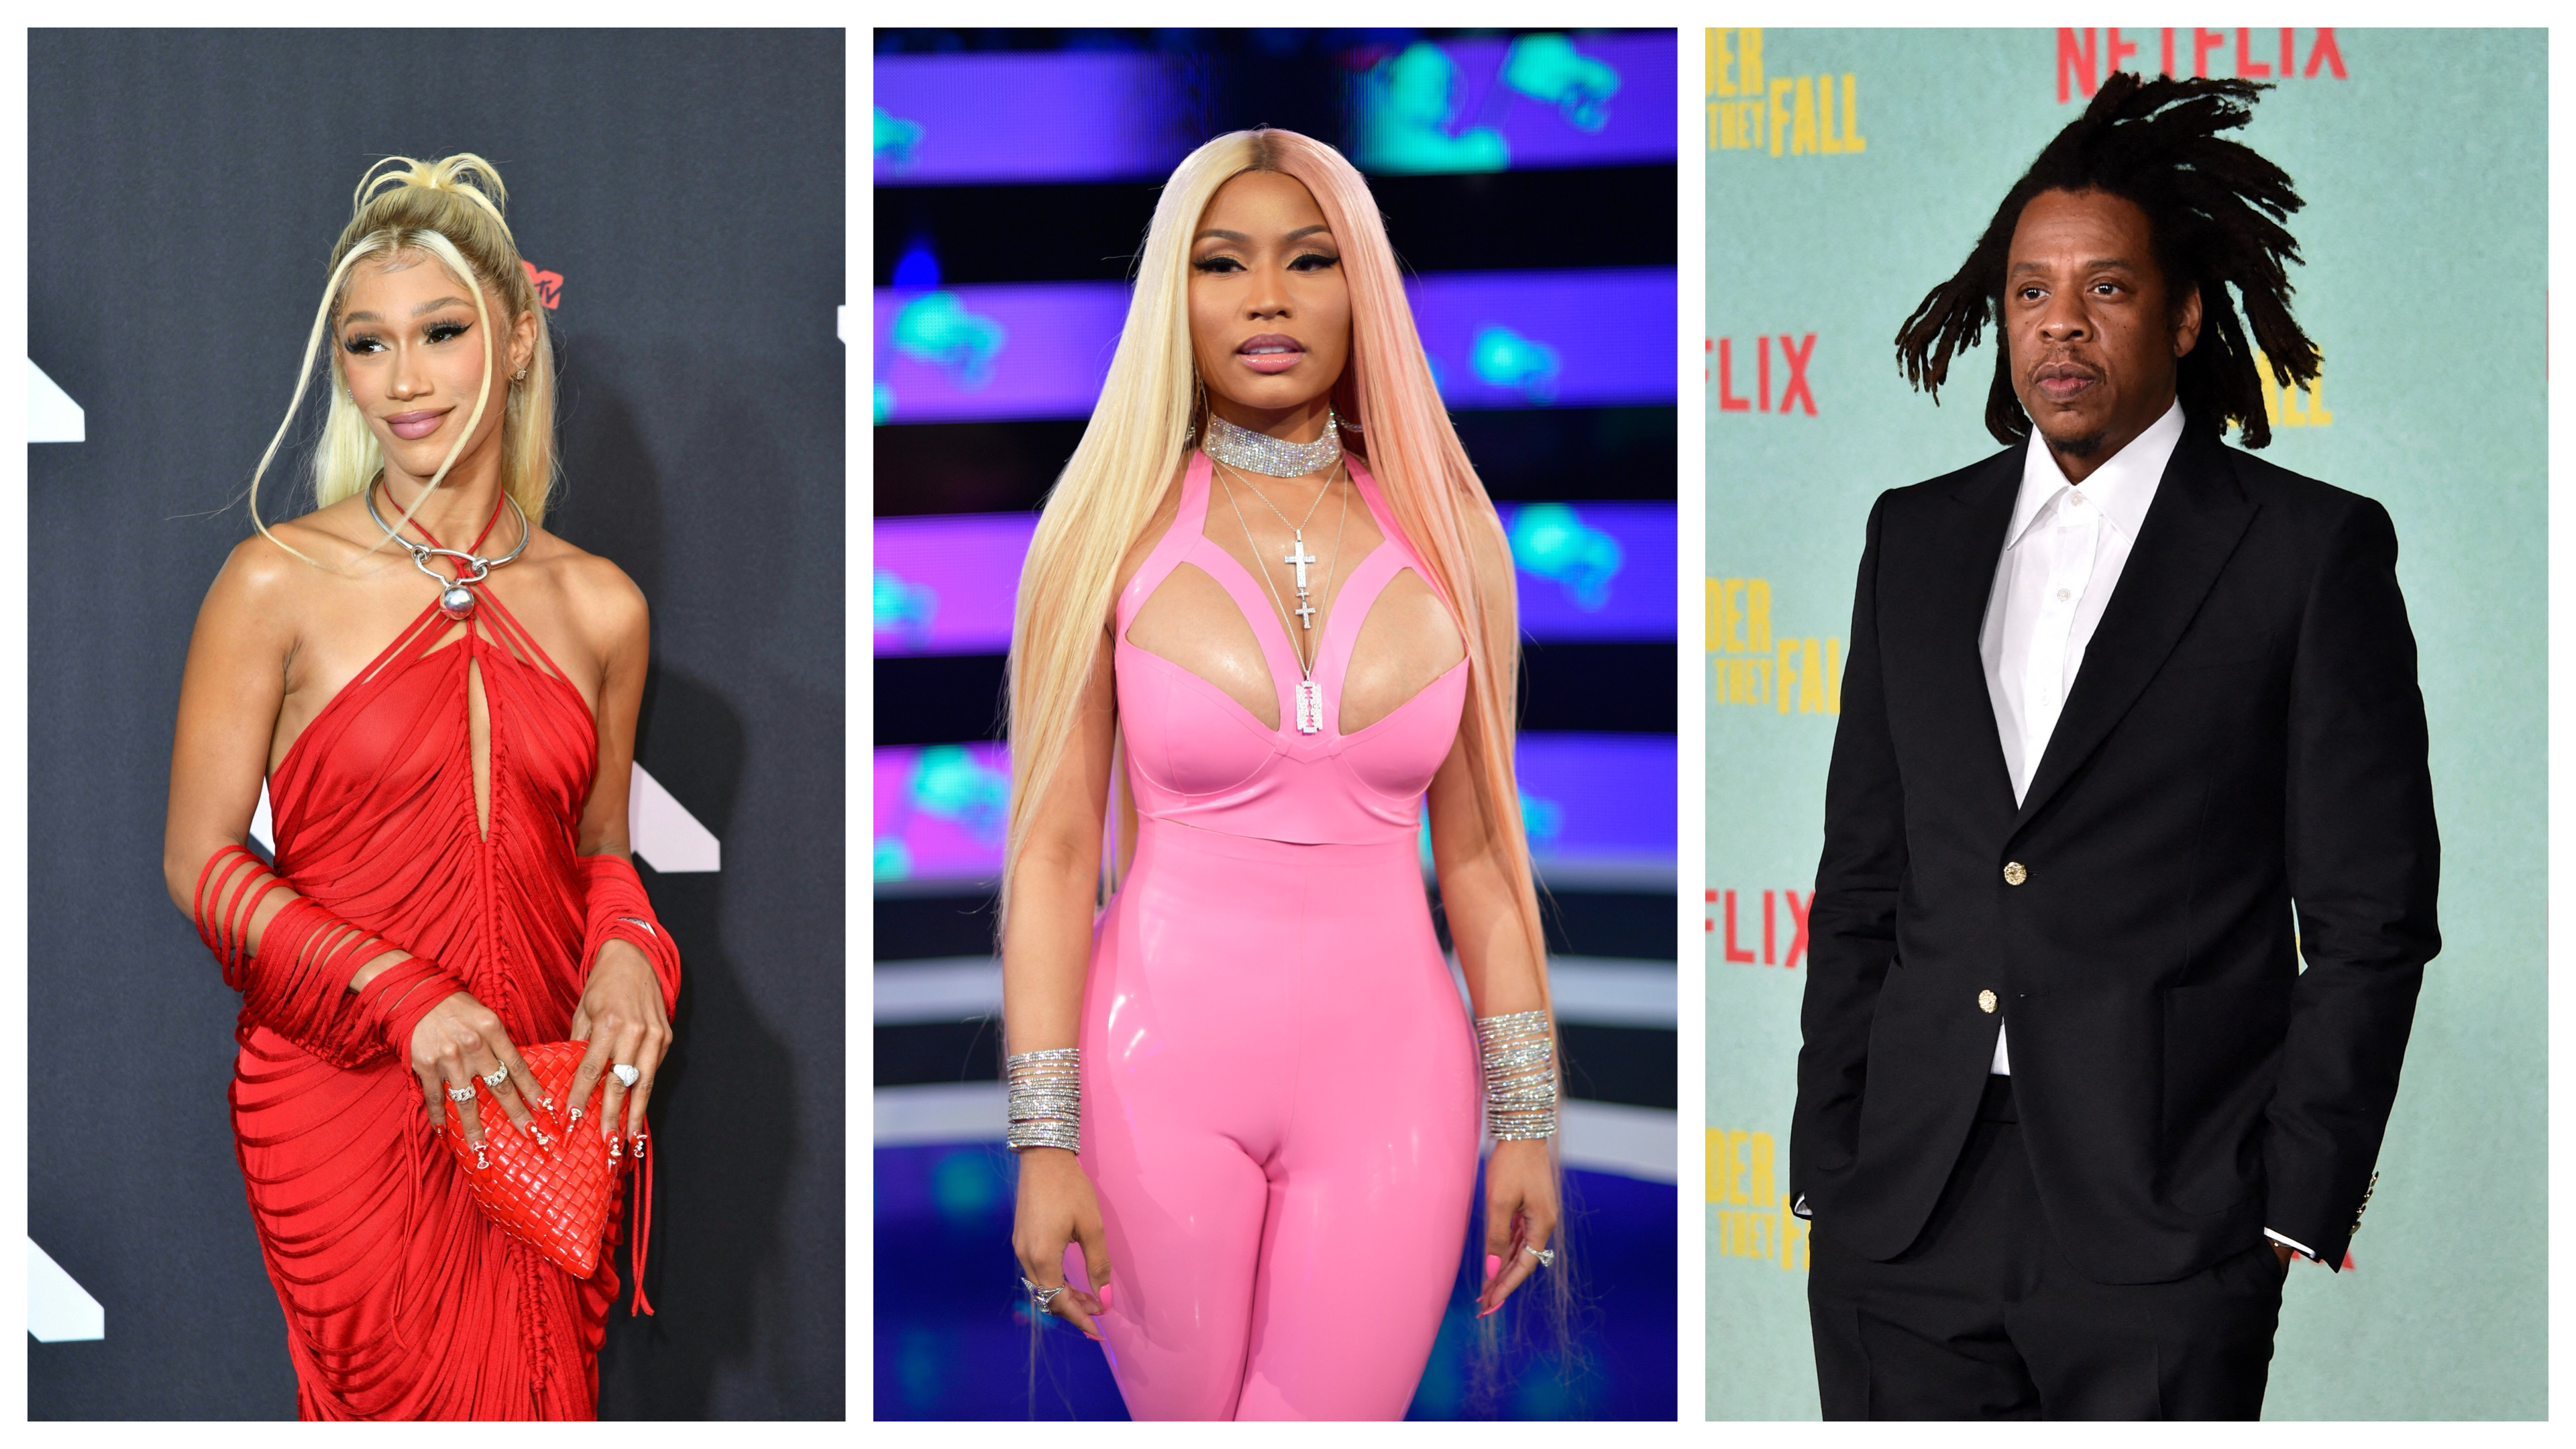 BIA. Nicki Minaj, JAY-Z